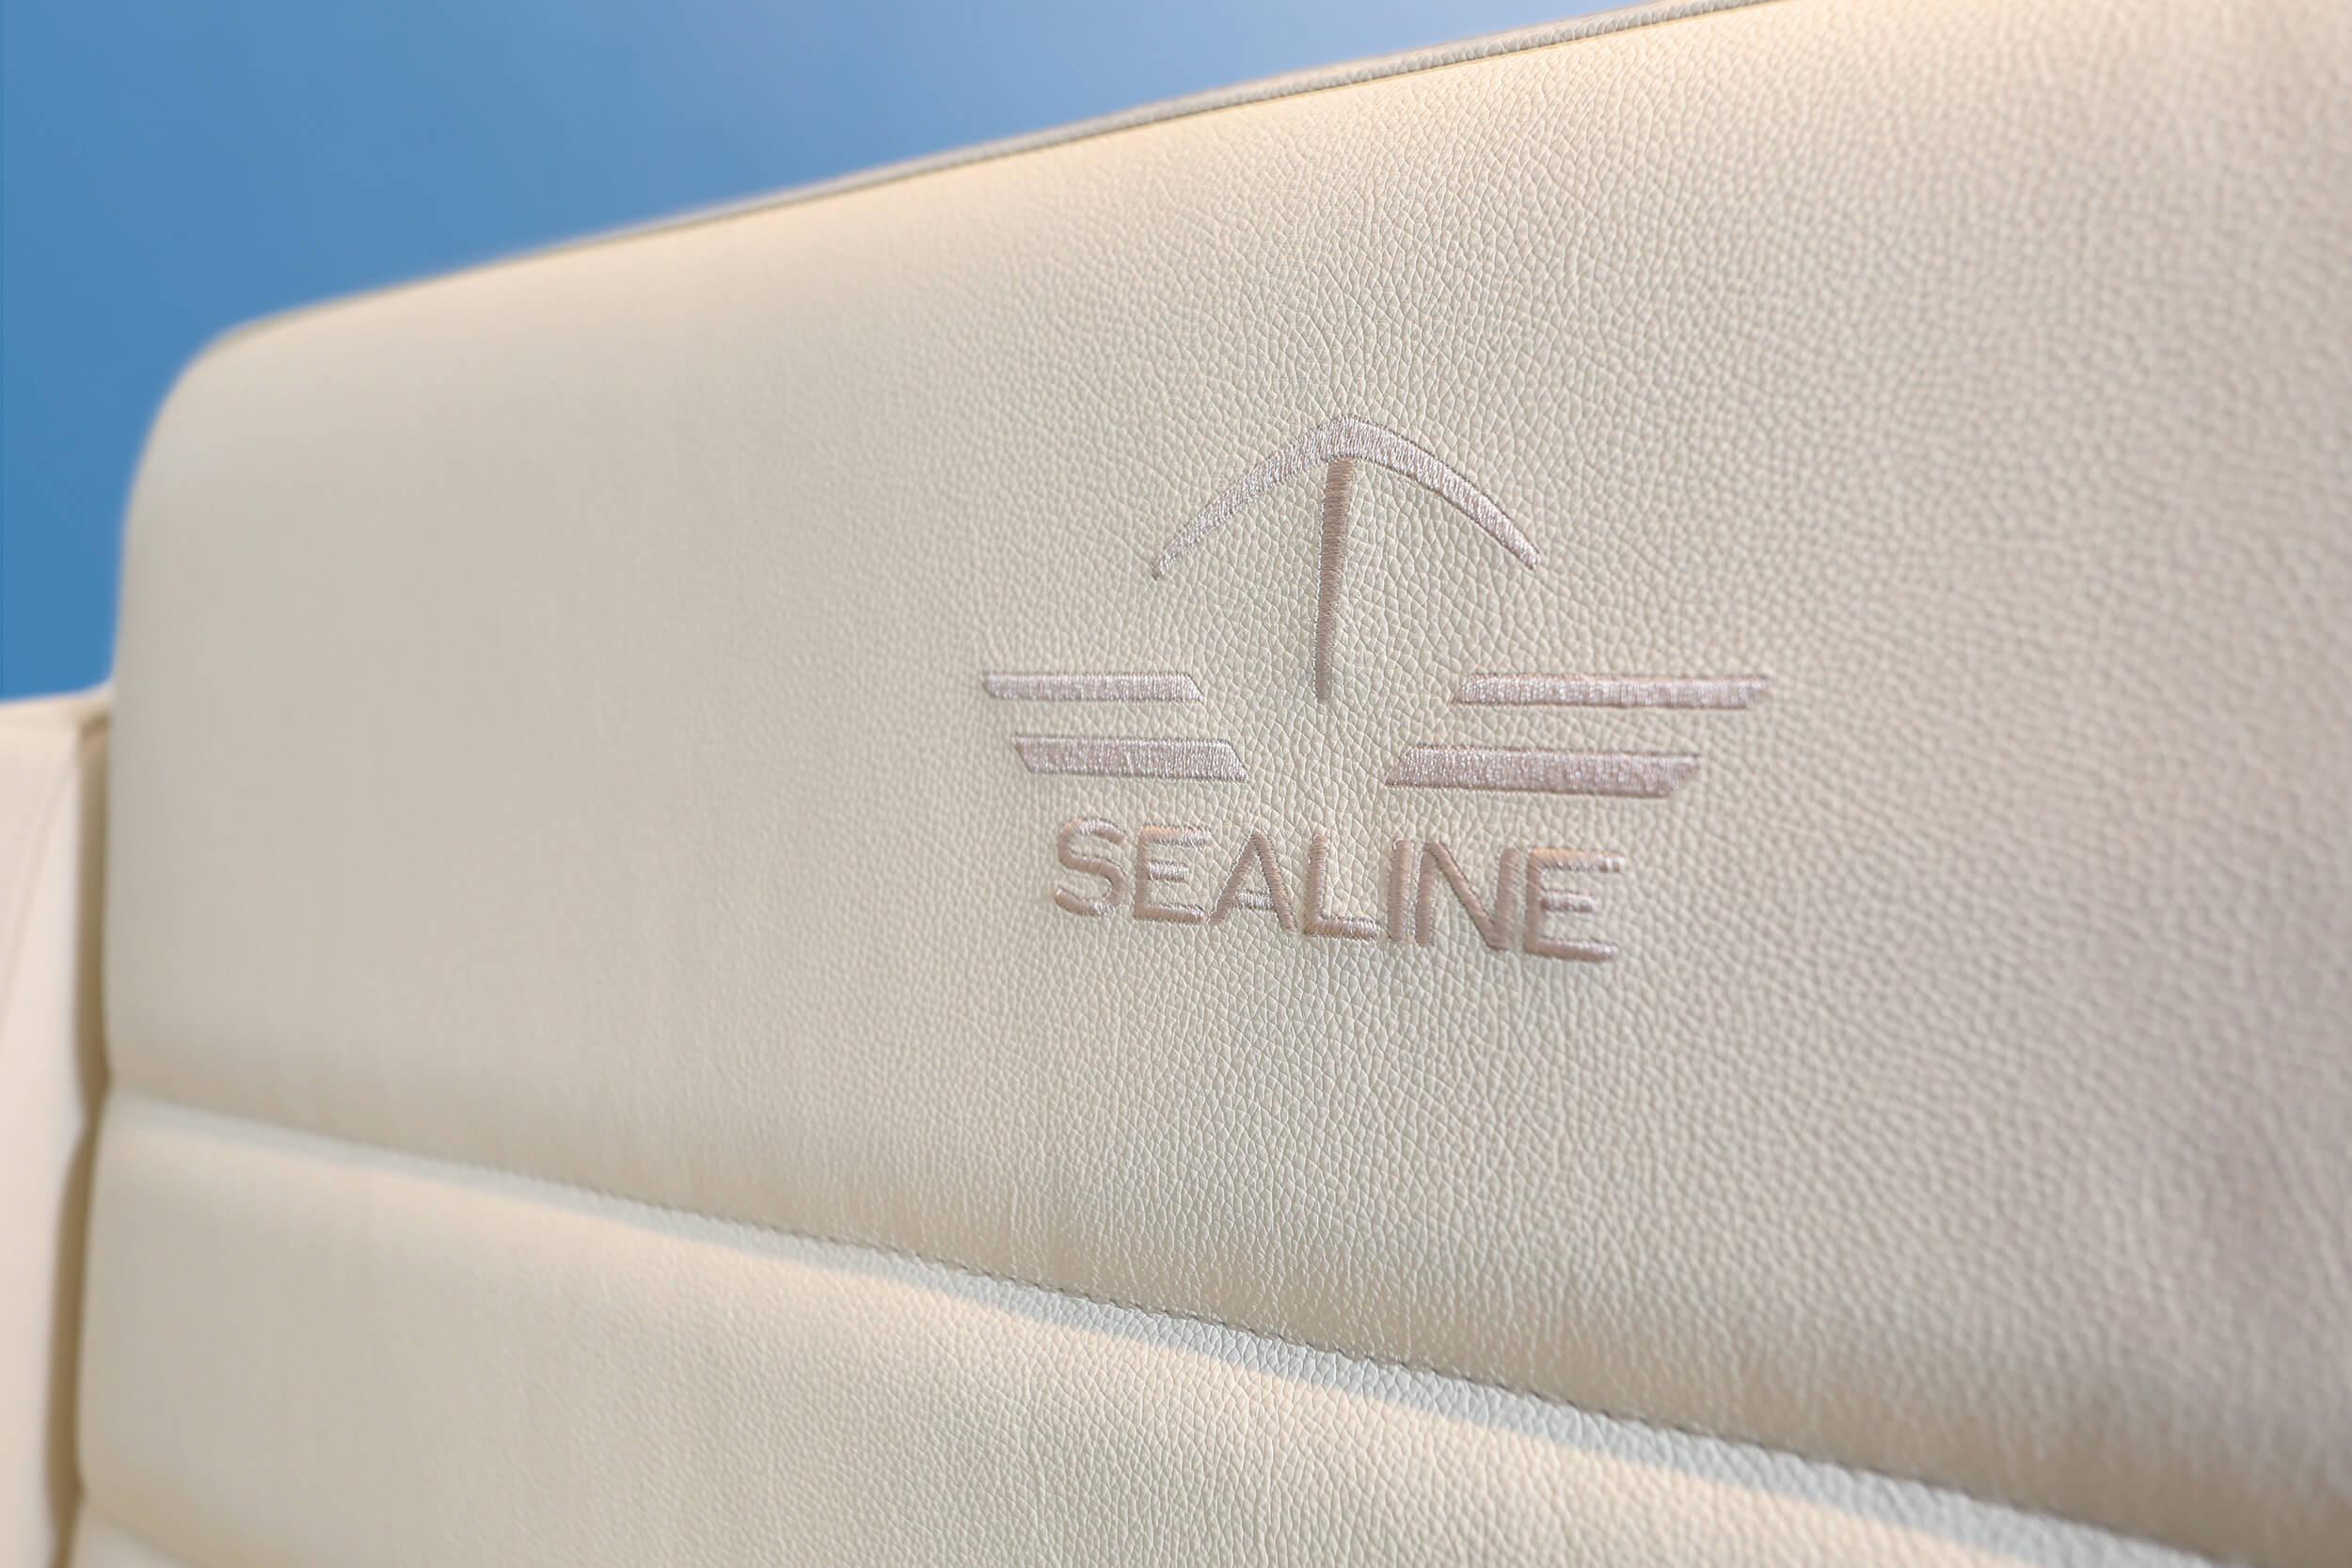 Sealine F430 Iç mekan görünümü | pilot copilot seats | Sealine